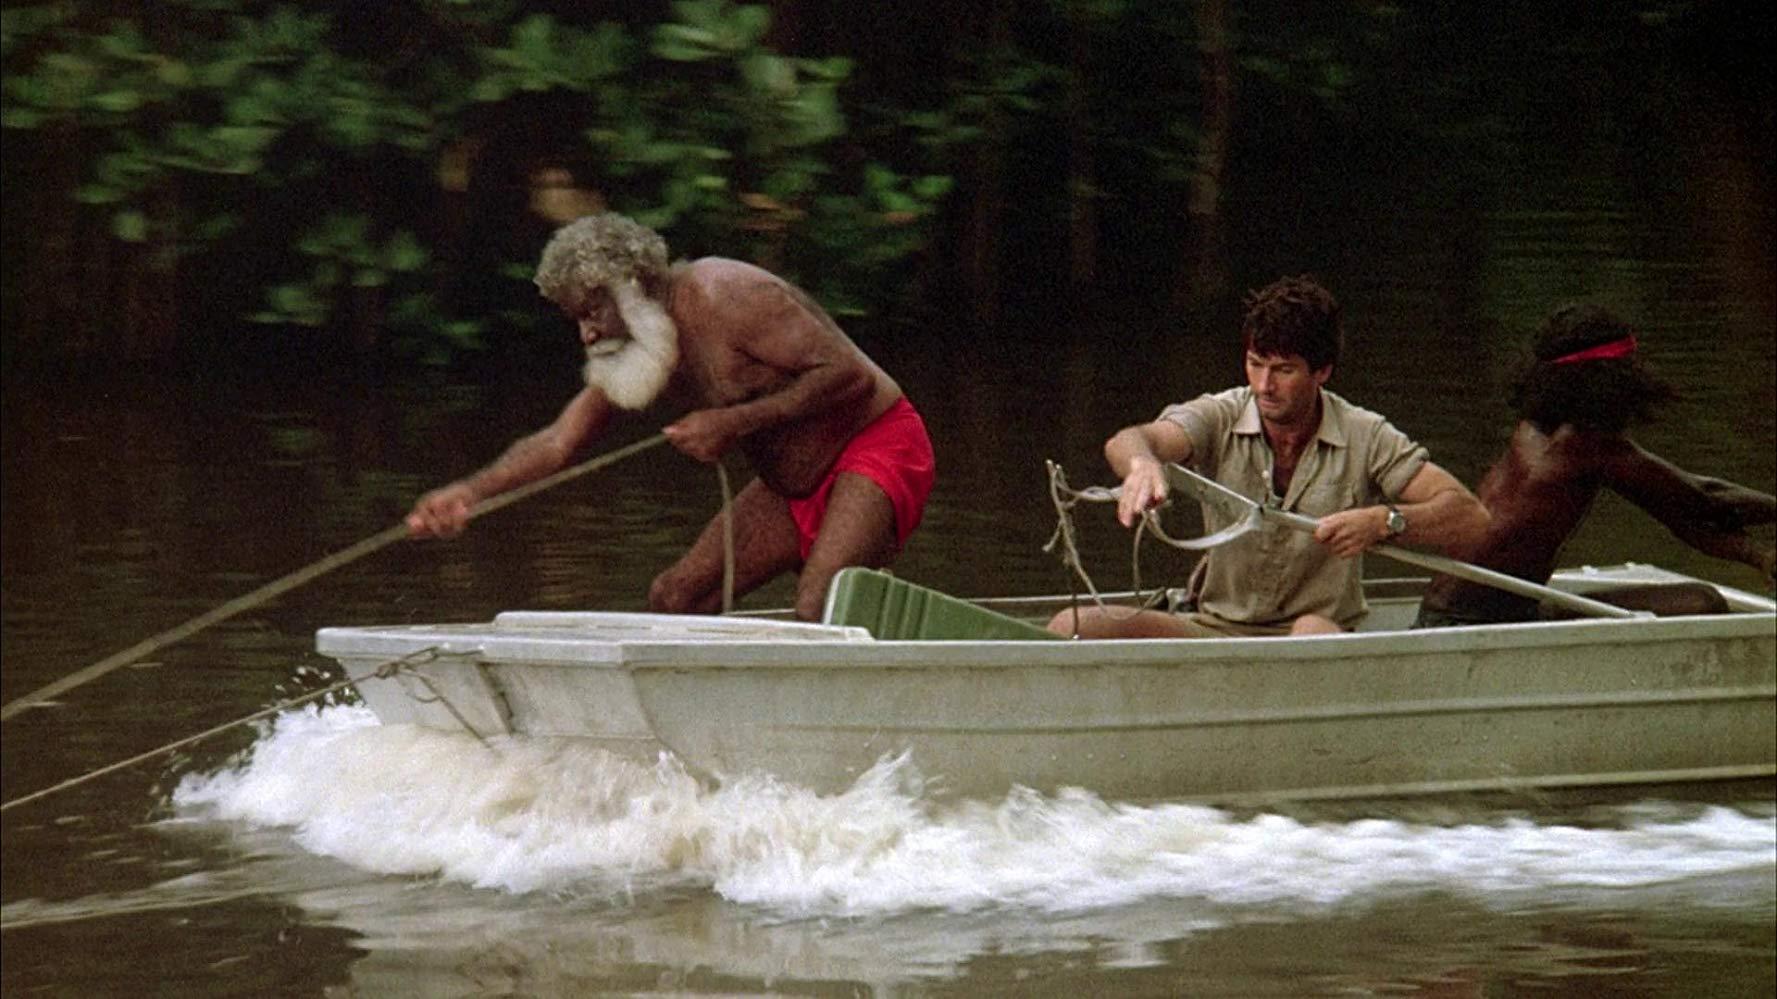 John Jarratt and the Aborigines go hunting the crocodile in Dark Age (1987)